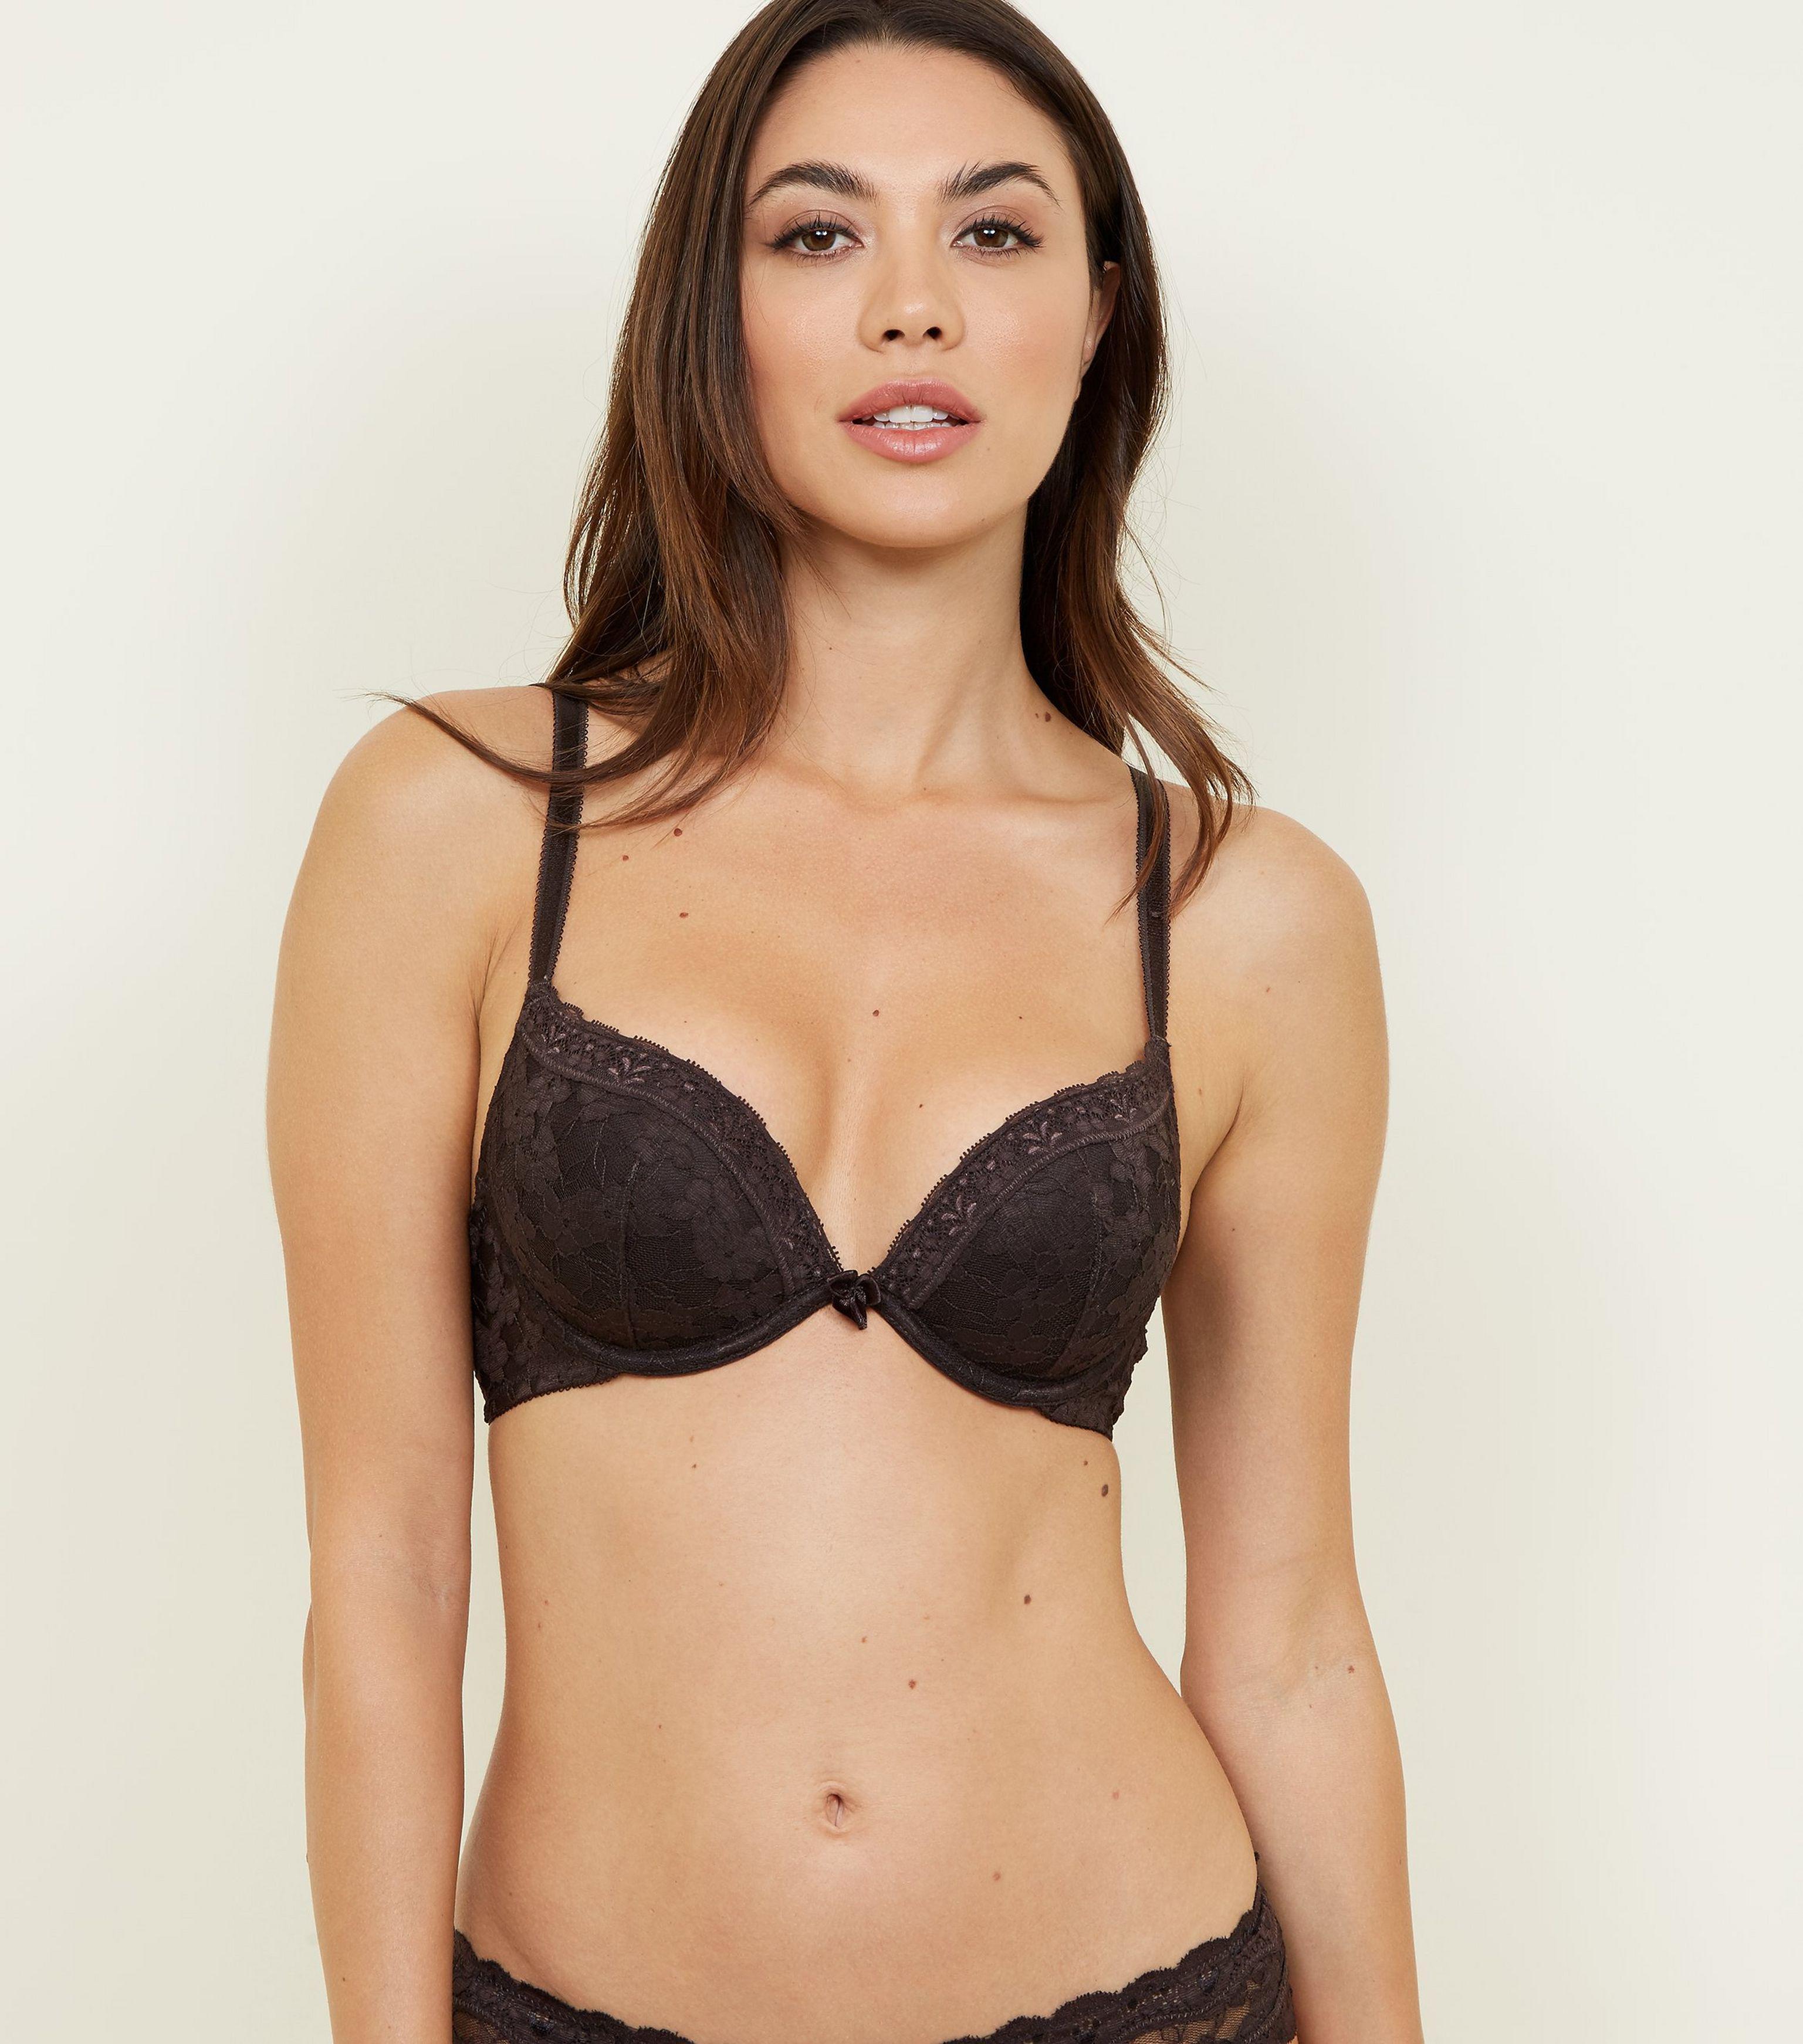 7595dd3302 New Look Dark Brown Lace Push-up Bra in Brown - Lyst